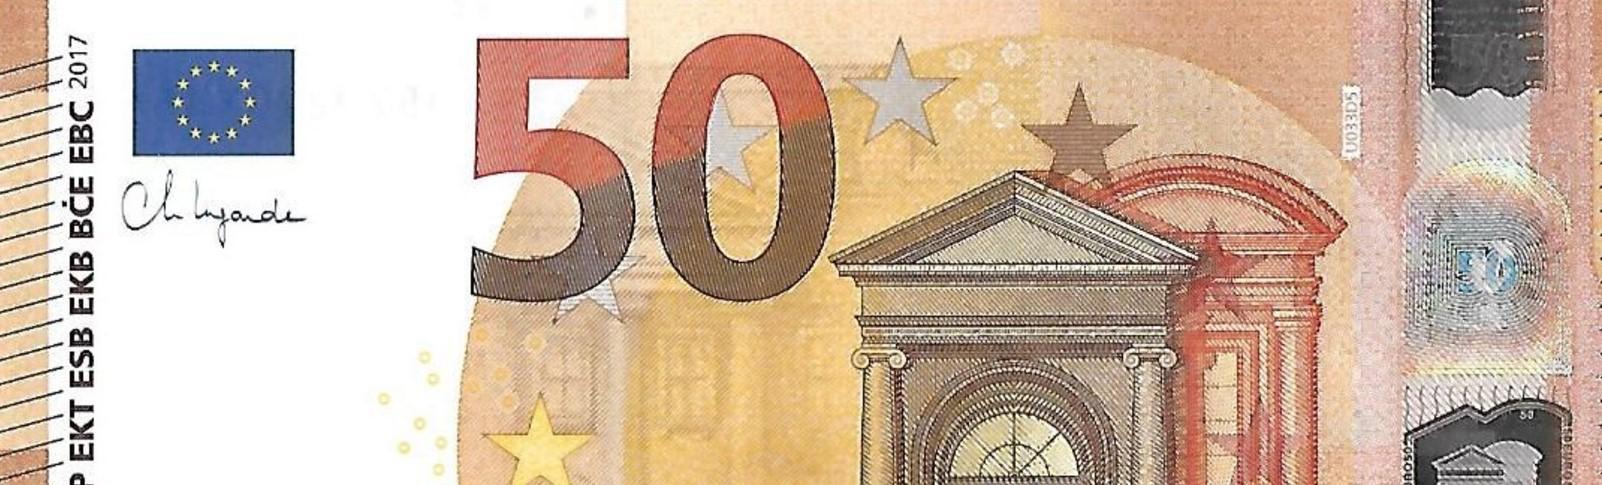 50_u_u_033_lagarde_-_collection_europe_.jpg